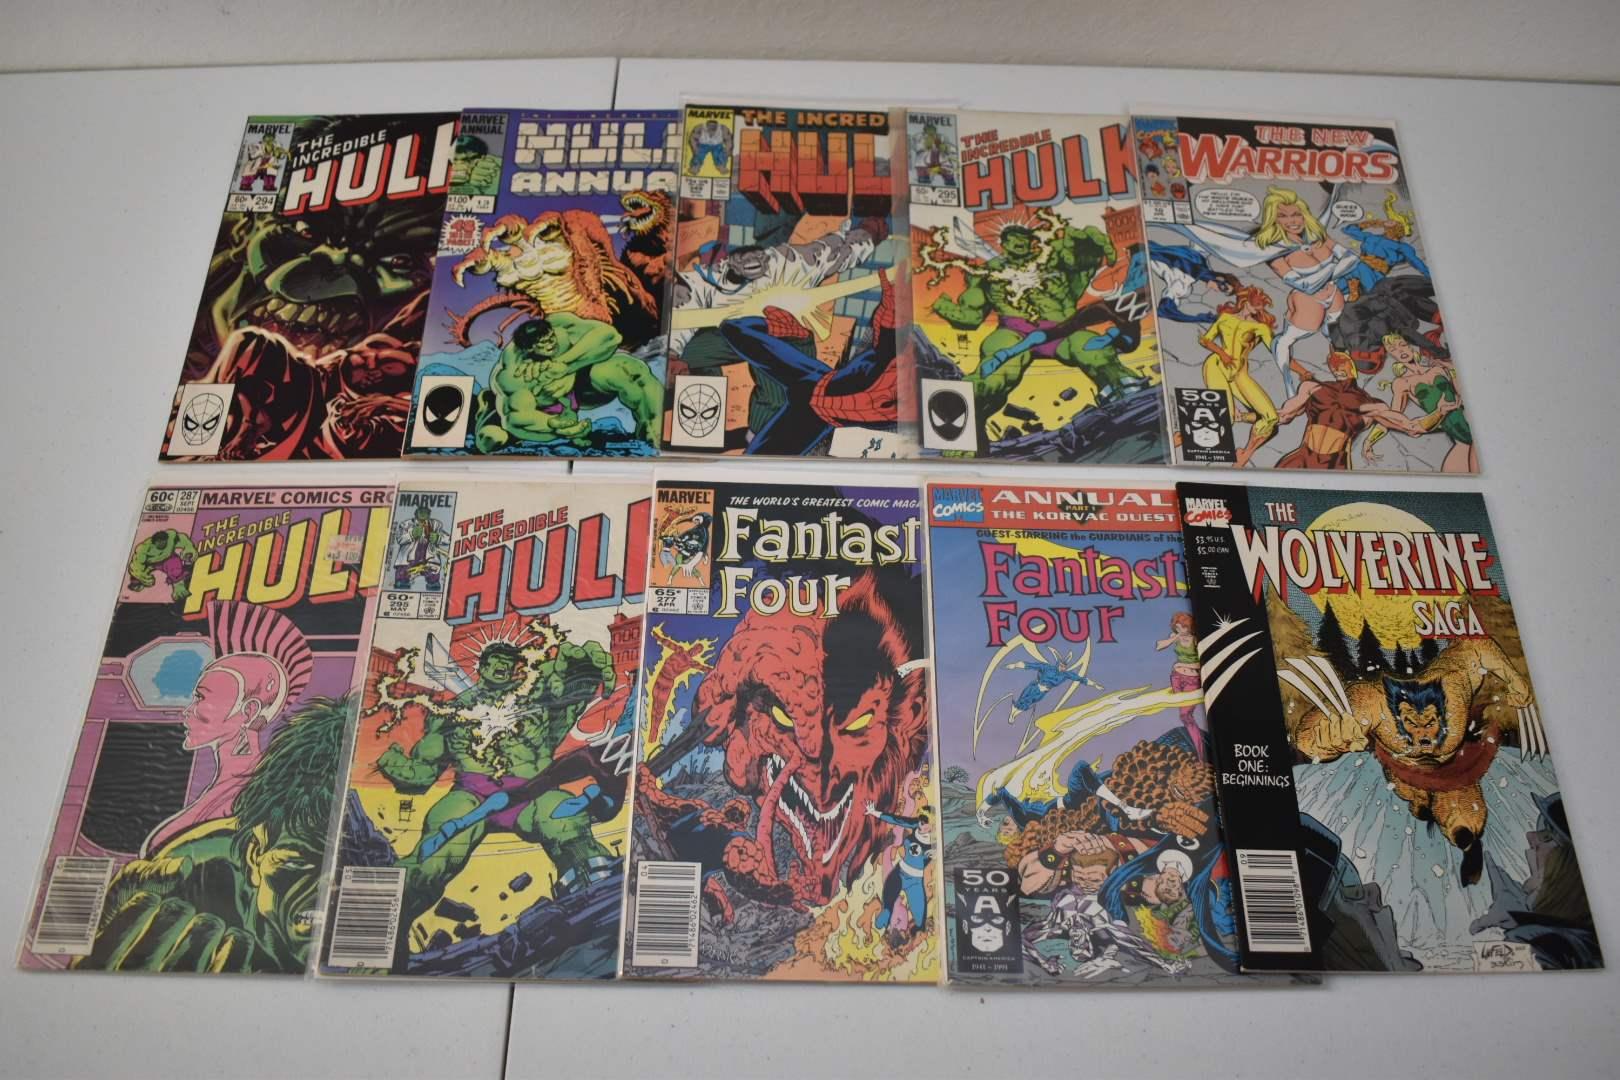 1980's & 90's Marvel Comics: Hulk, Fantastic Four, Wolverine